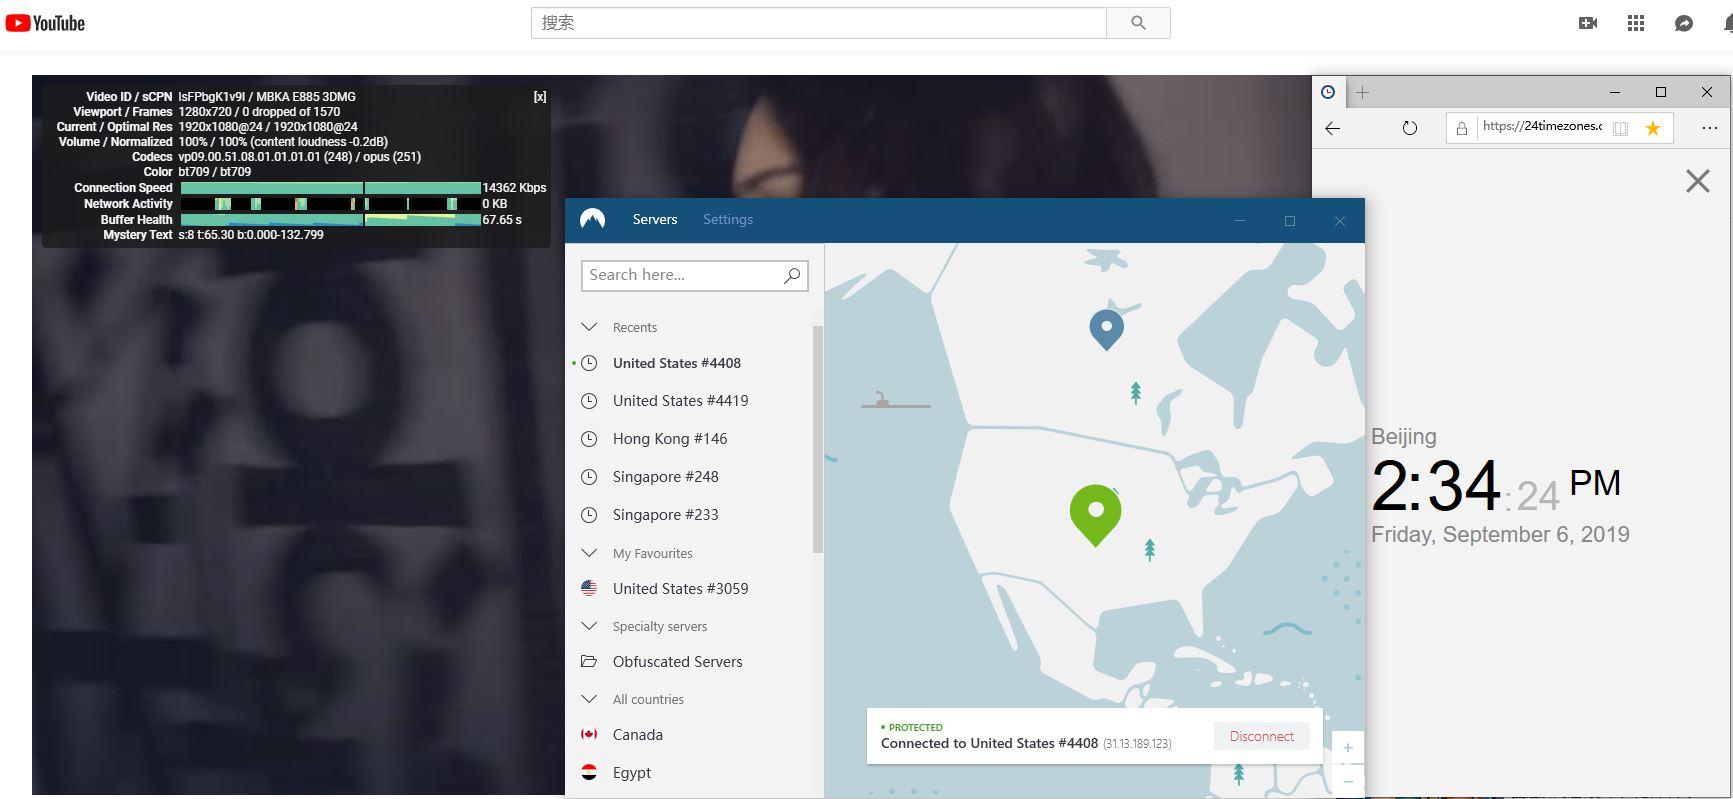 windows nordvpn United states #4408 服务器 中国vpn翻墙 科学上网 YouTube速度测试-20190906